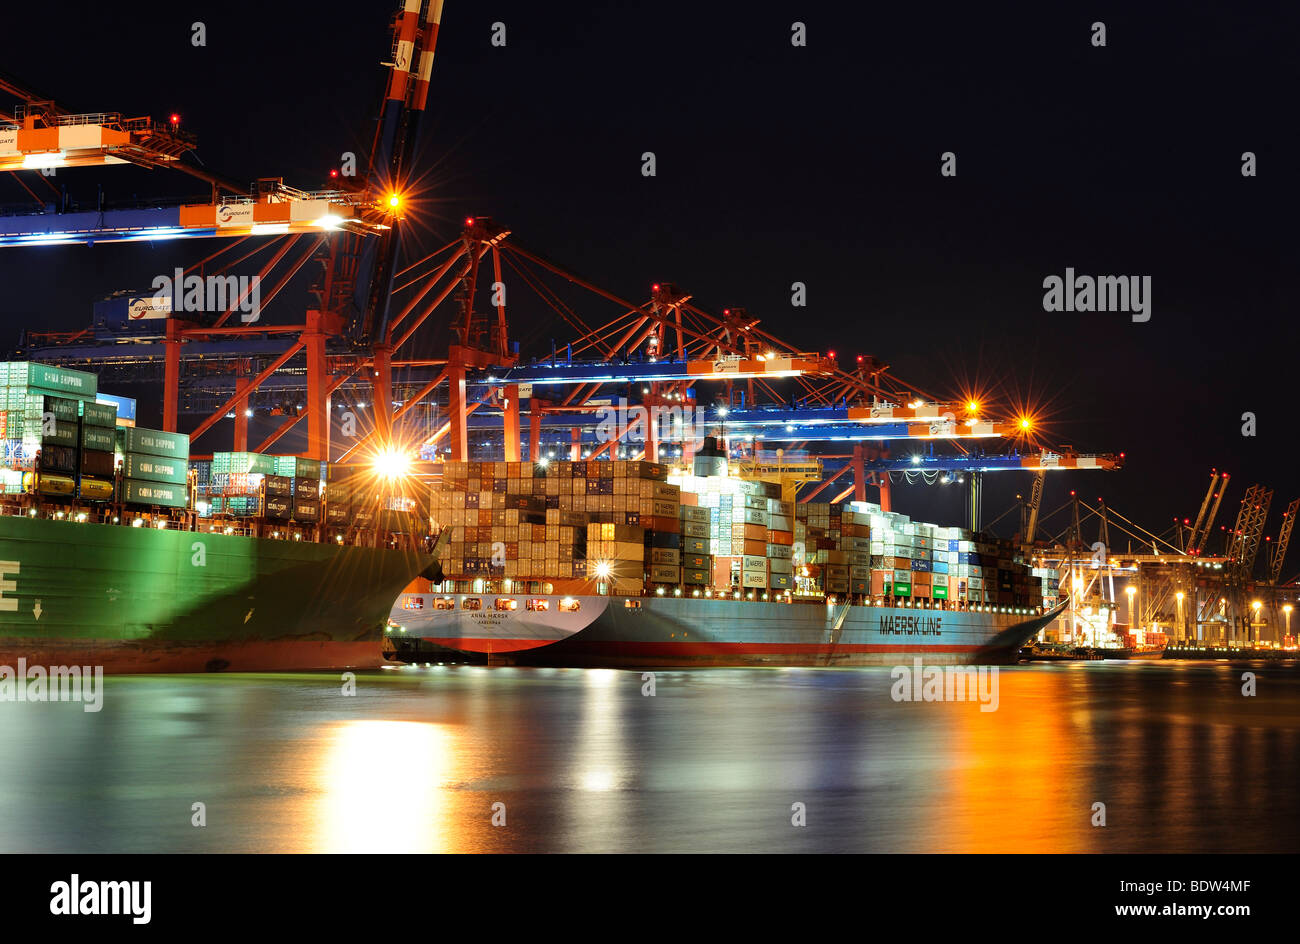 Container ship being loaded at Buchardkai Terminal, Hamburg, Germany, Europe Stock Photo